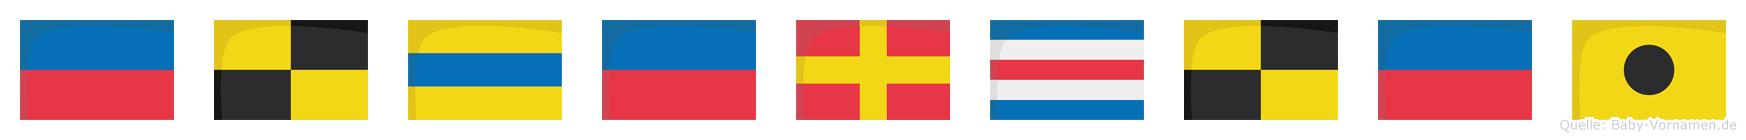 Elderclei im Flaggenalphabet